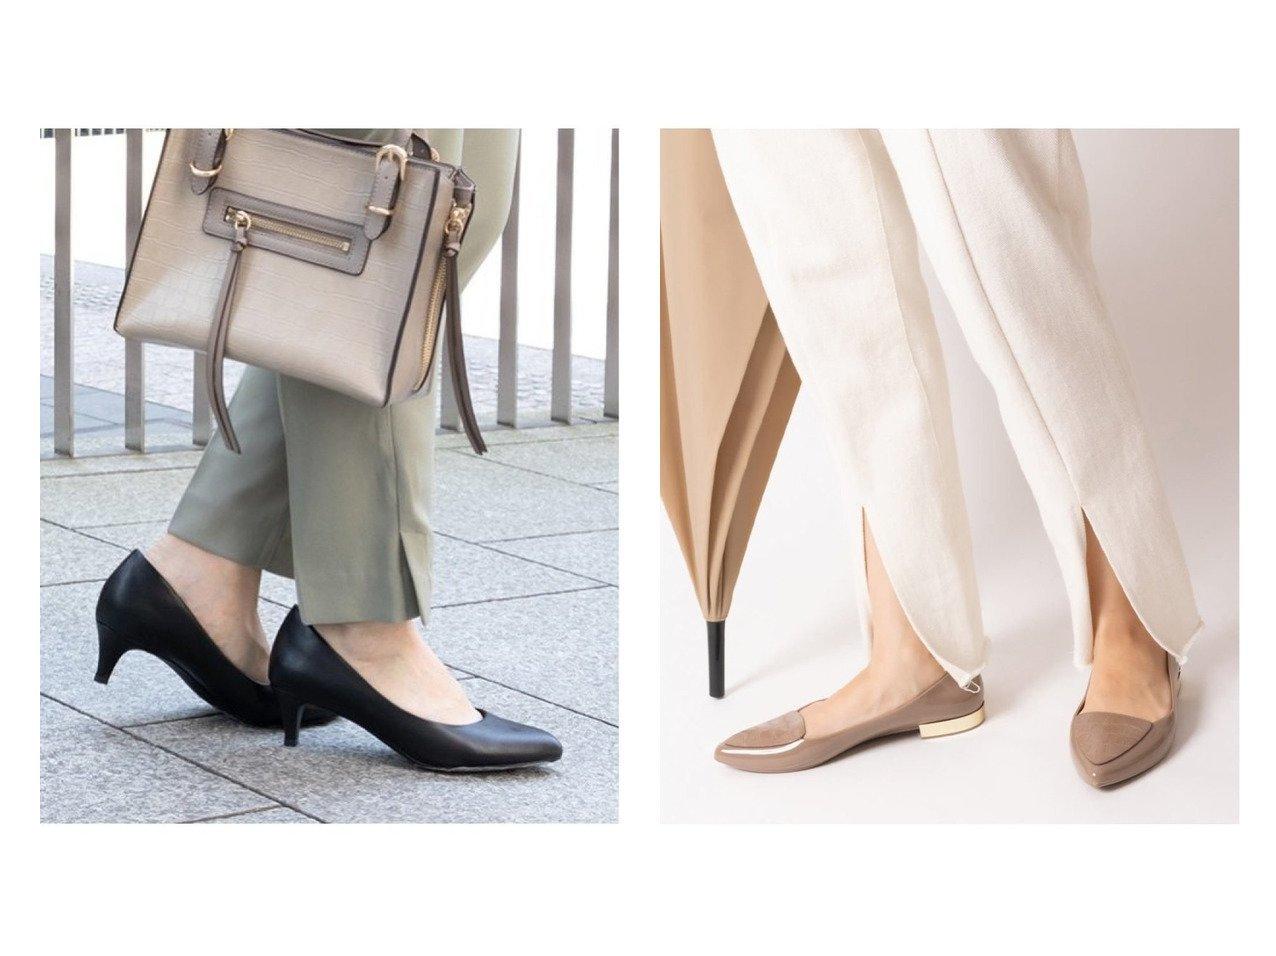 【RANDA/ランダ】のストレスフリー/走れる美脚パンプスミドルヒール&ポインテッドトゥクロコレインシューズ おすすめ!人気、トレンド・レディースファッションの通販 おすすめで人気の流行・トレンド、ファッションの通販商品 インテリア・家具・メンズファッション・キッズファッション・レディースファッション・服の通販 founy(ファニー) https://founy.com/ ファッション Fashion レディースファッション WOMEN クロコ シューズ フラット ベーシック クッション ライニング 人気 抗菌 |ID:crp329100000061955